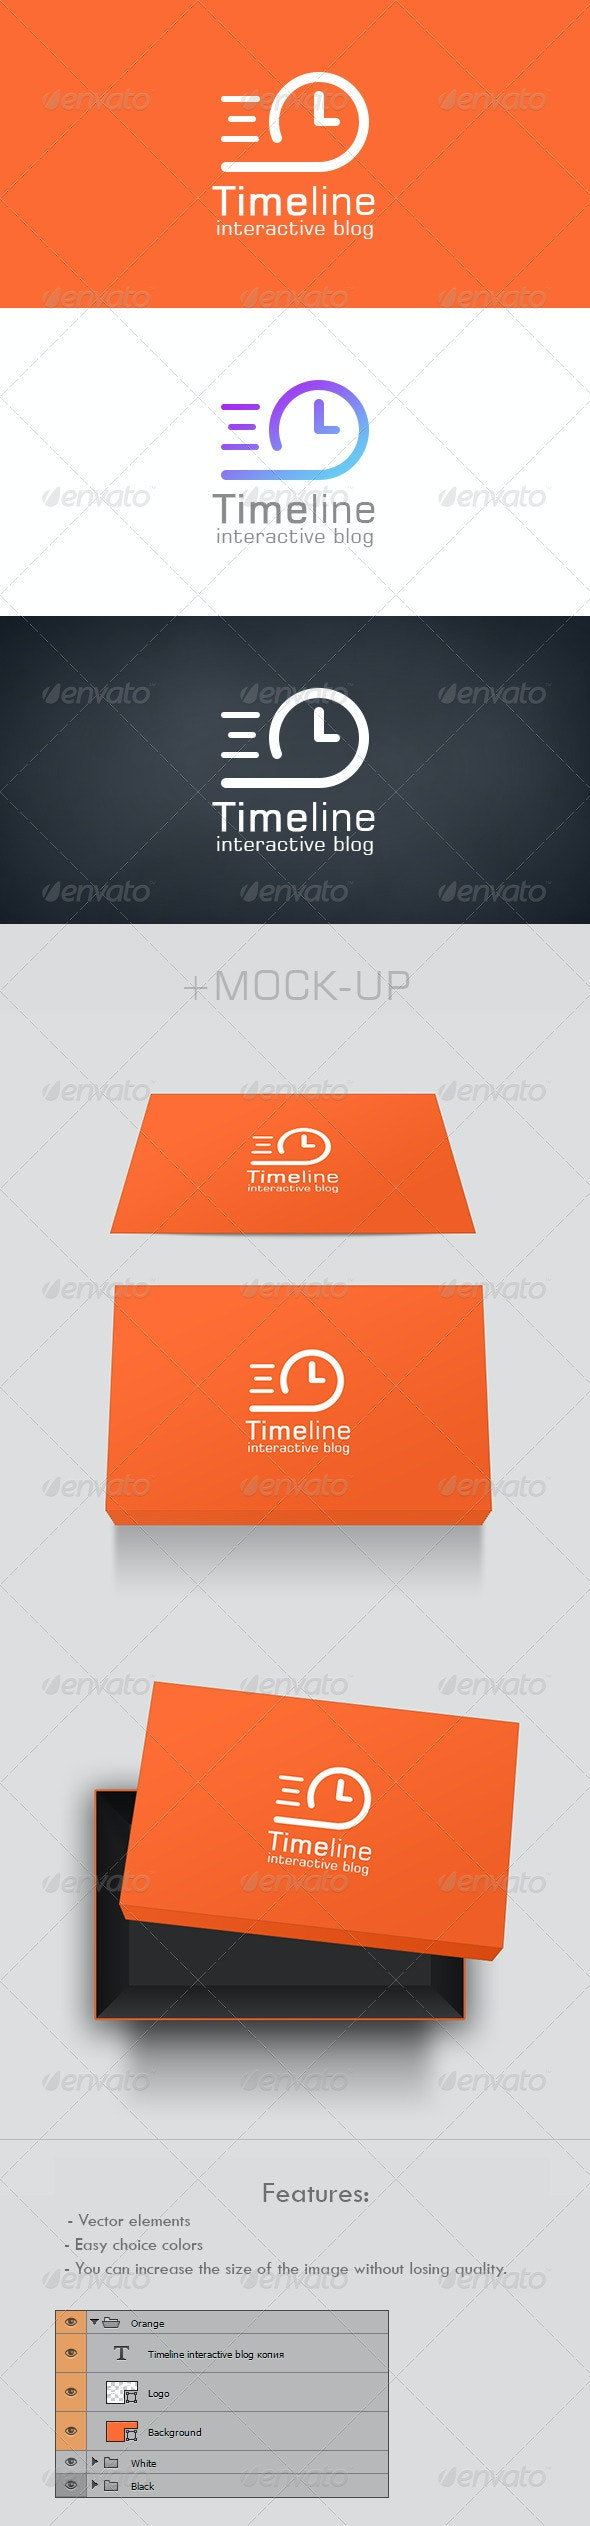 TimeLine Logo - Objects Logo Templates